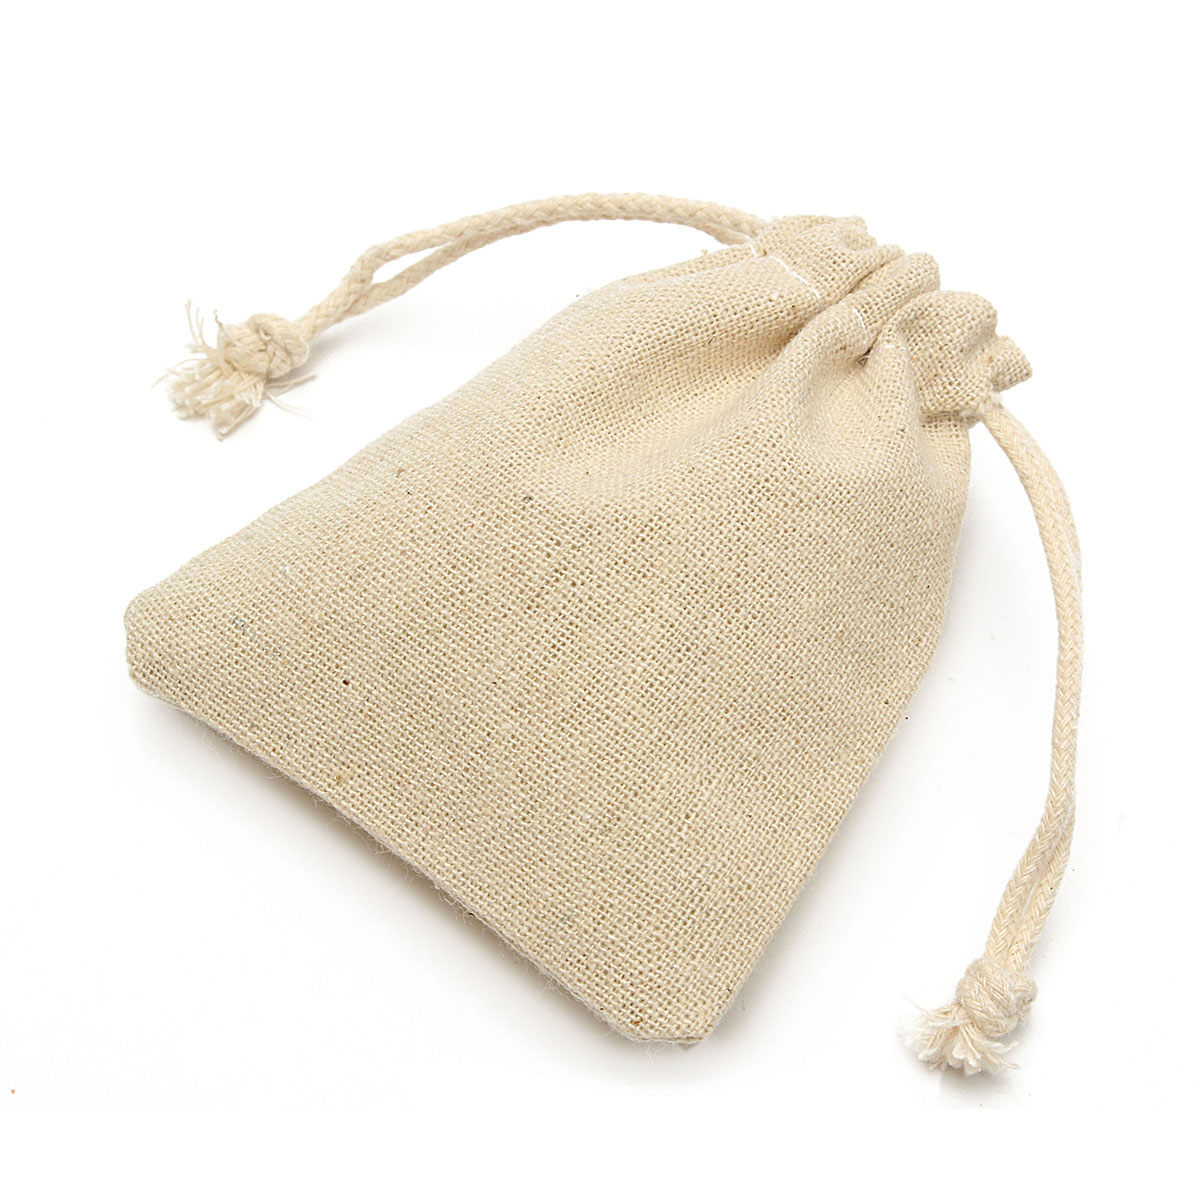 30x Small Burlap Linen Jute Sack Jewelry Pouch Drawstring Wedding Gift Mini Bags